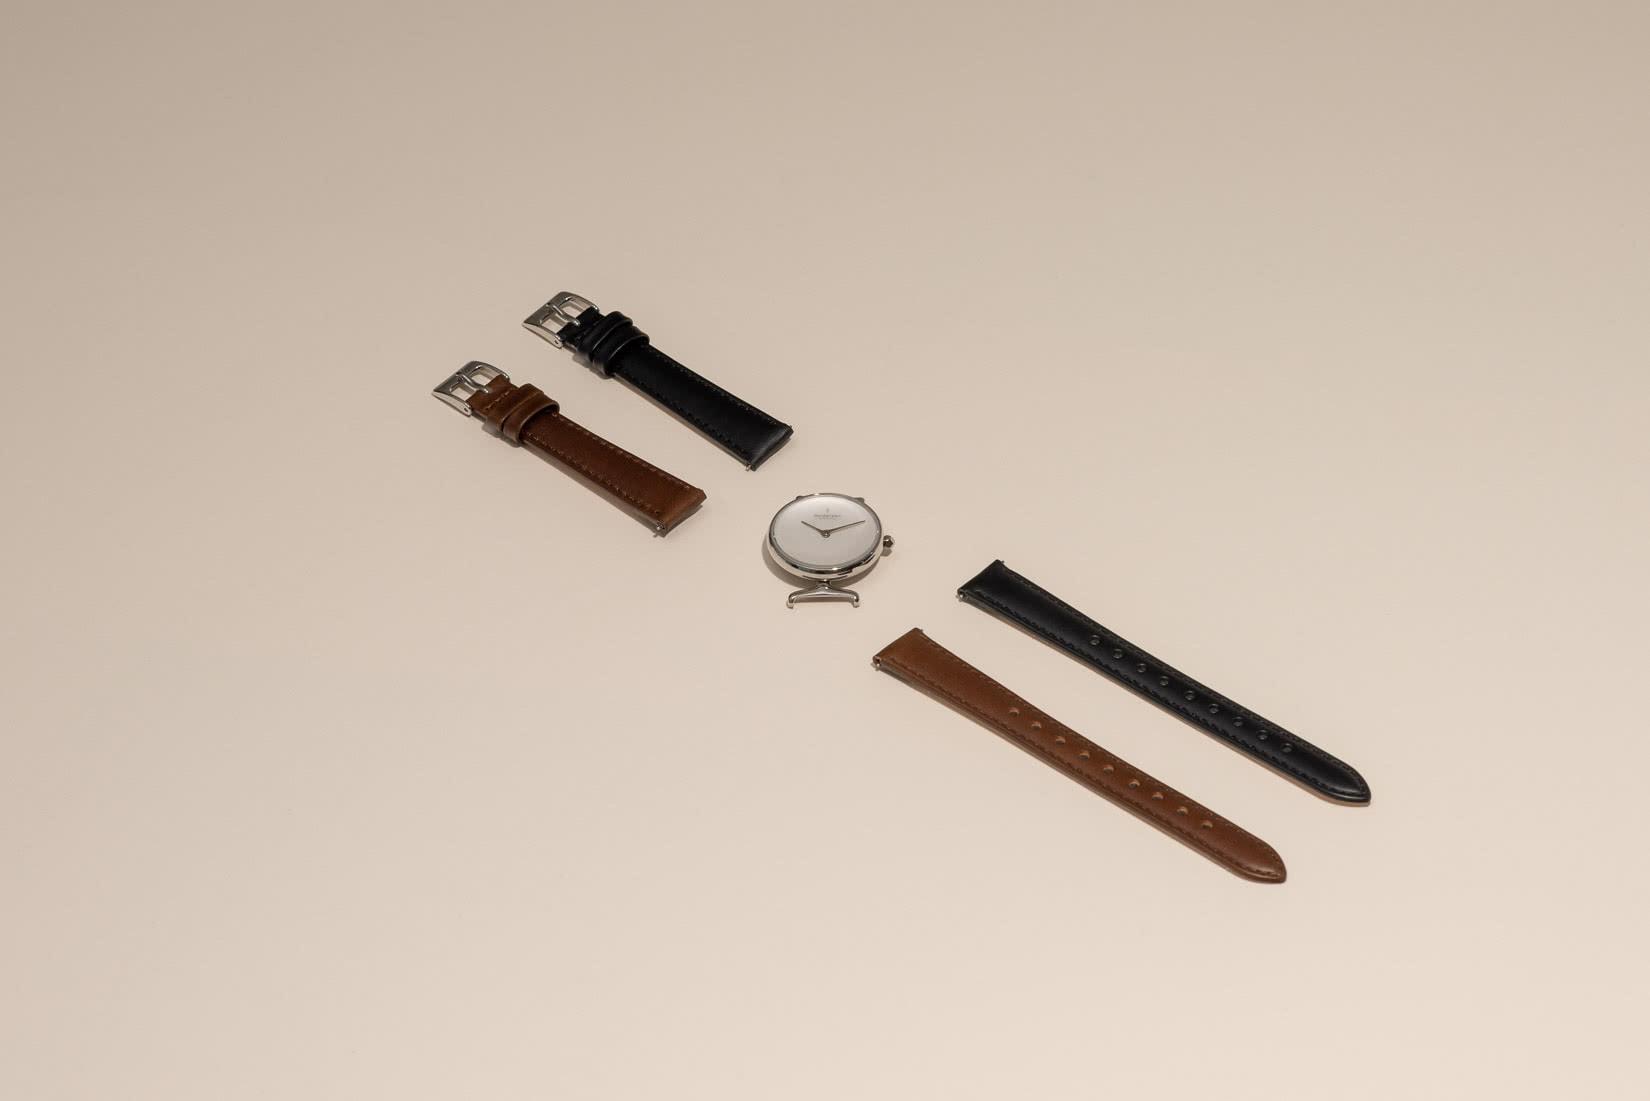 nordgreen watch unika review - Luxe Digital